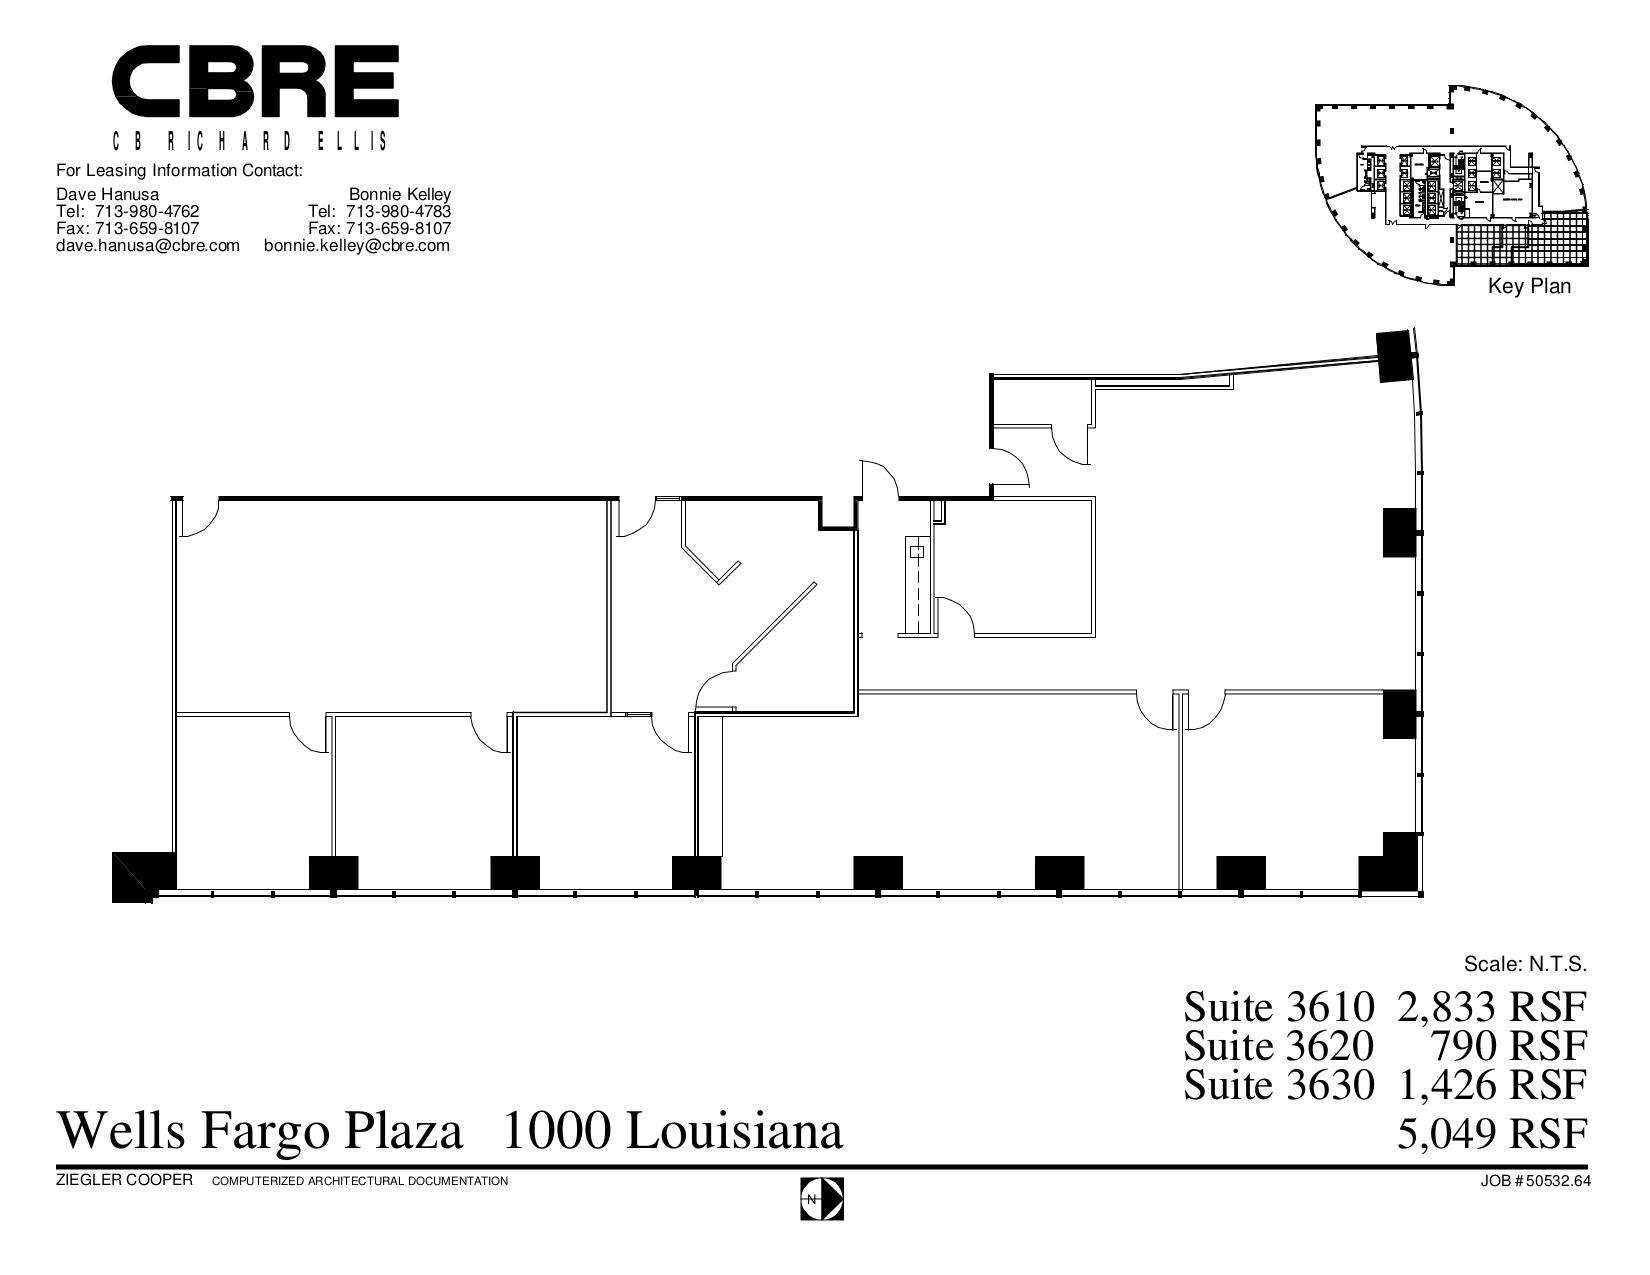 wells fargo plaza 1000 louisiana st 36th floor suite